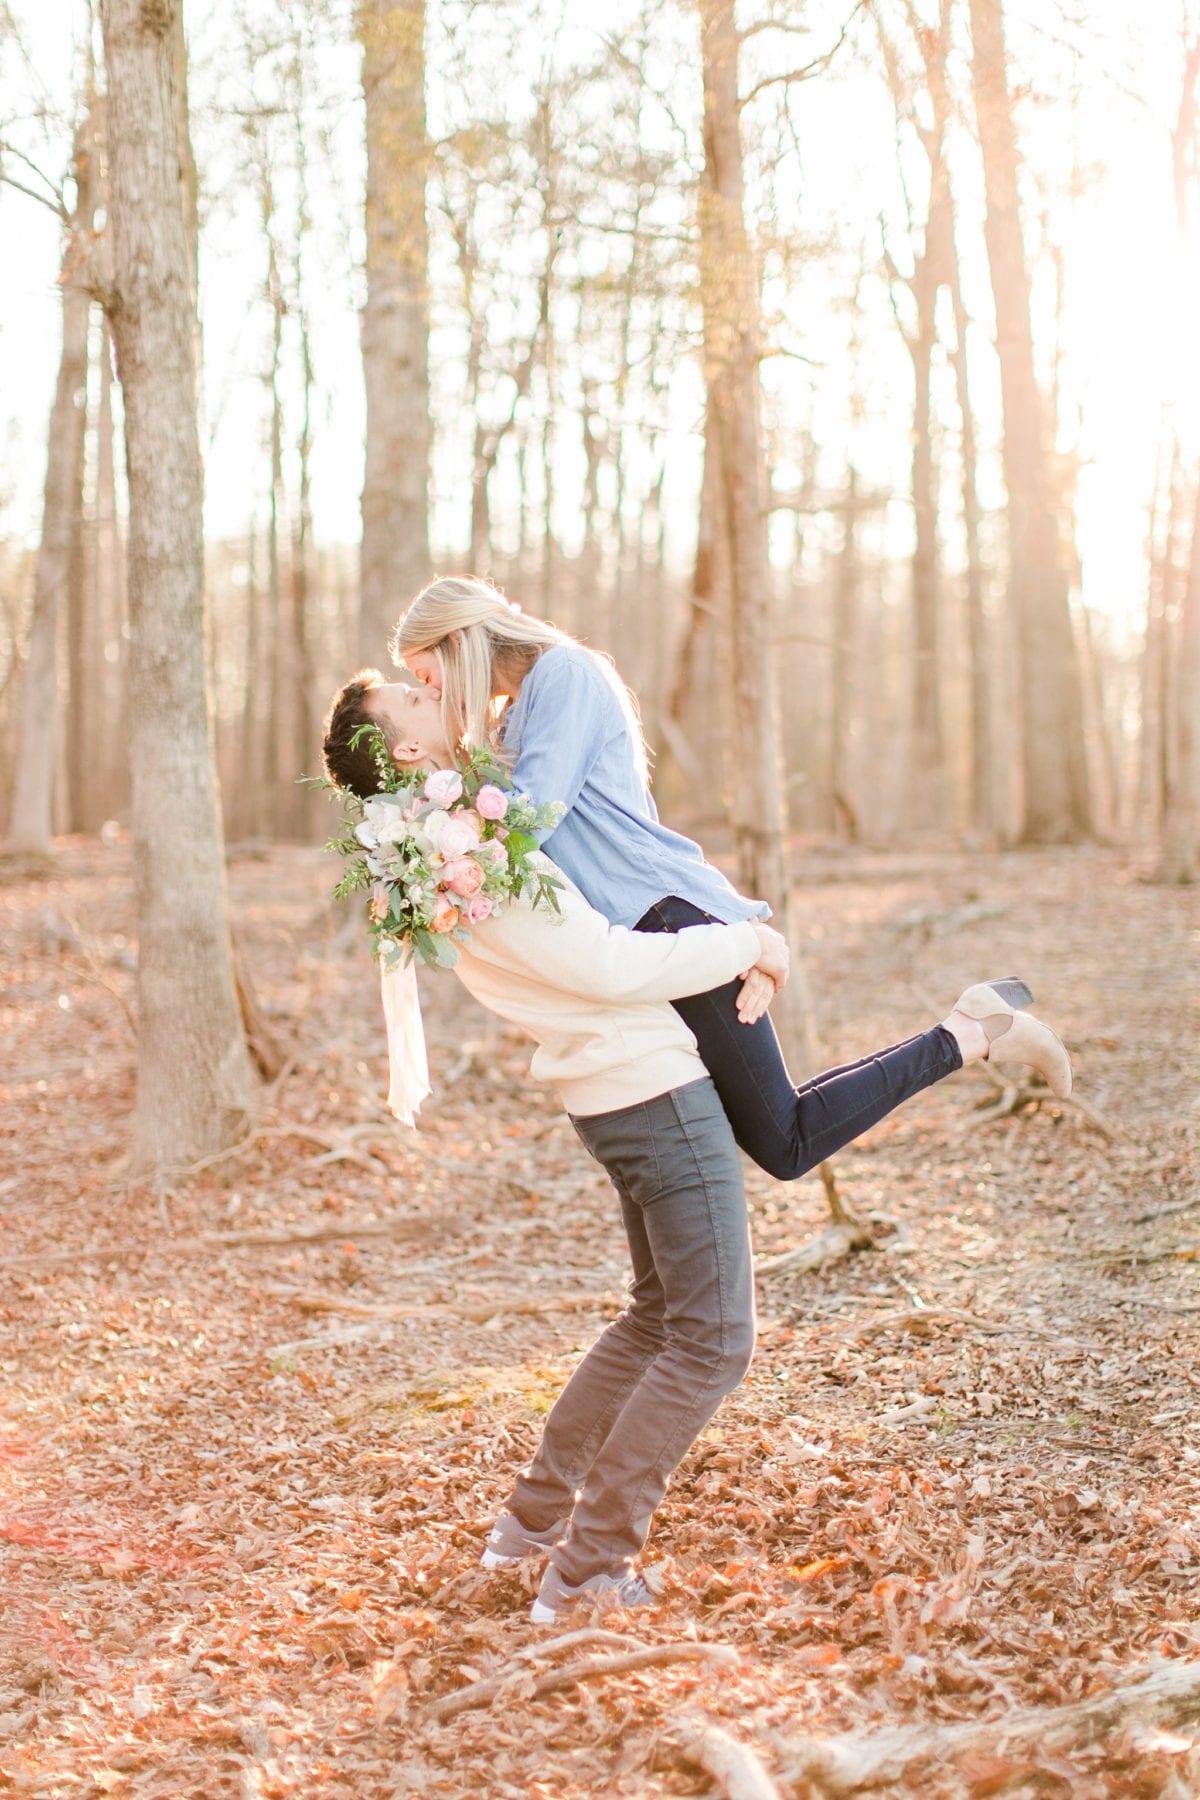 Manassas Battlefield Engagement Session Virginia Wedding Photographer Danielle & Charlie Megan Kelsey Photography-5515.jpg